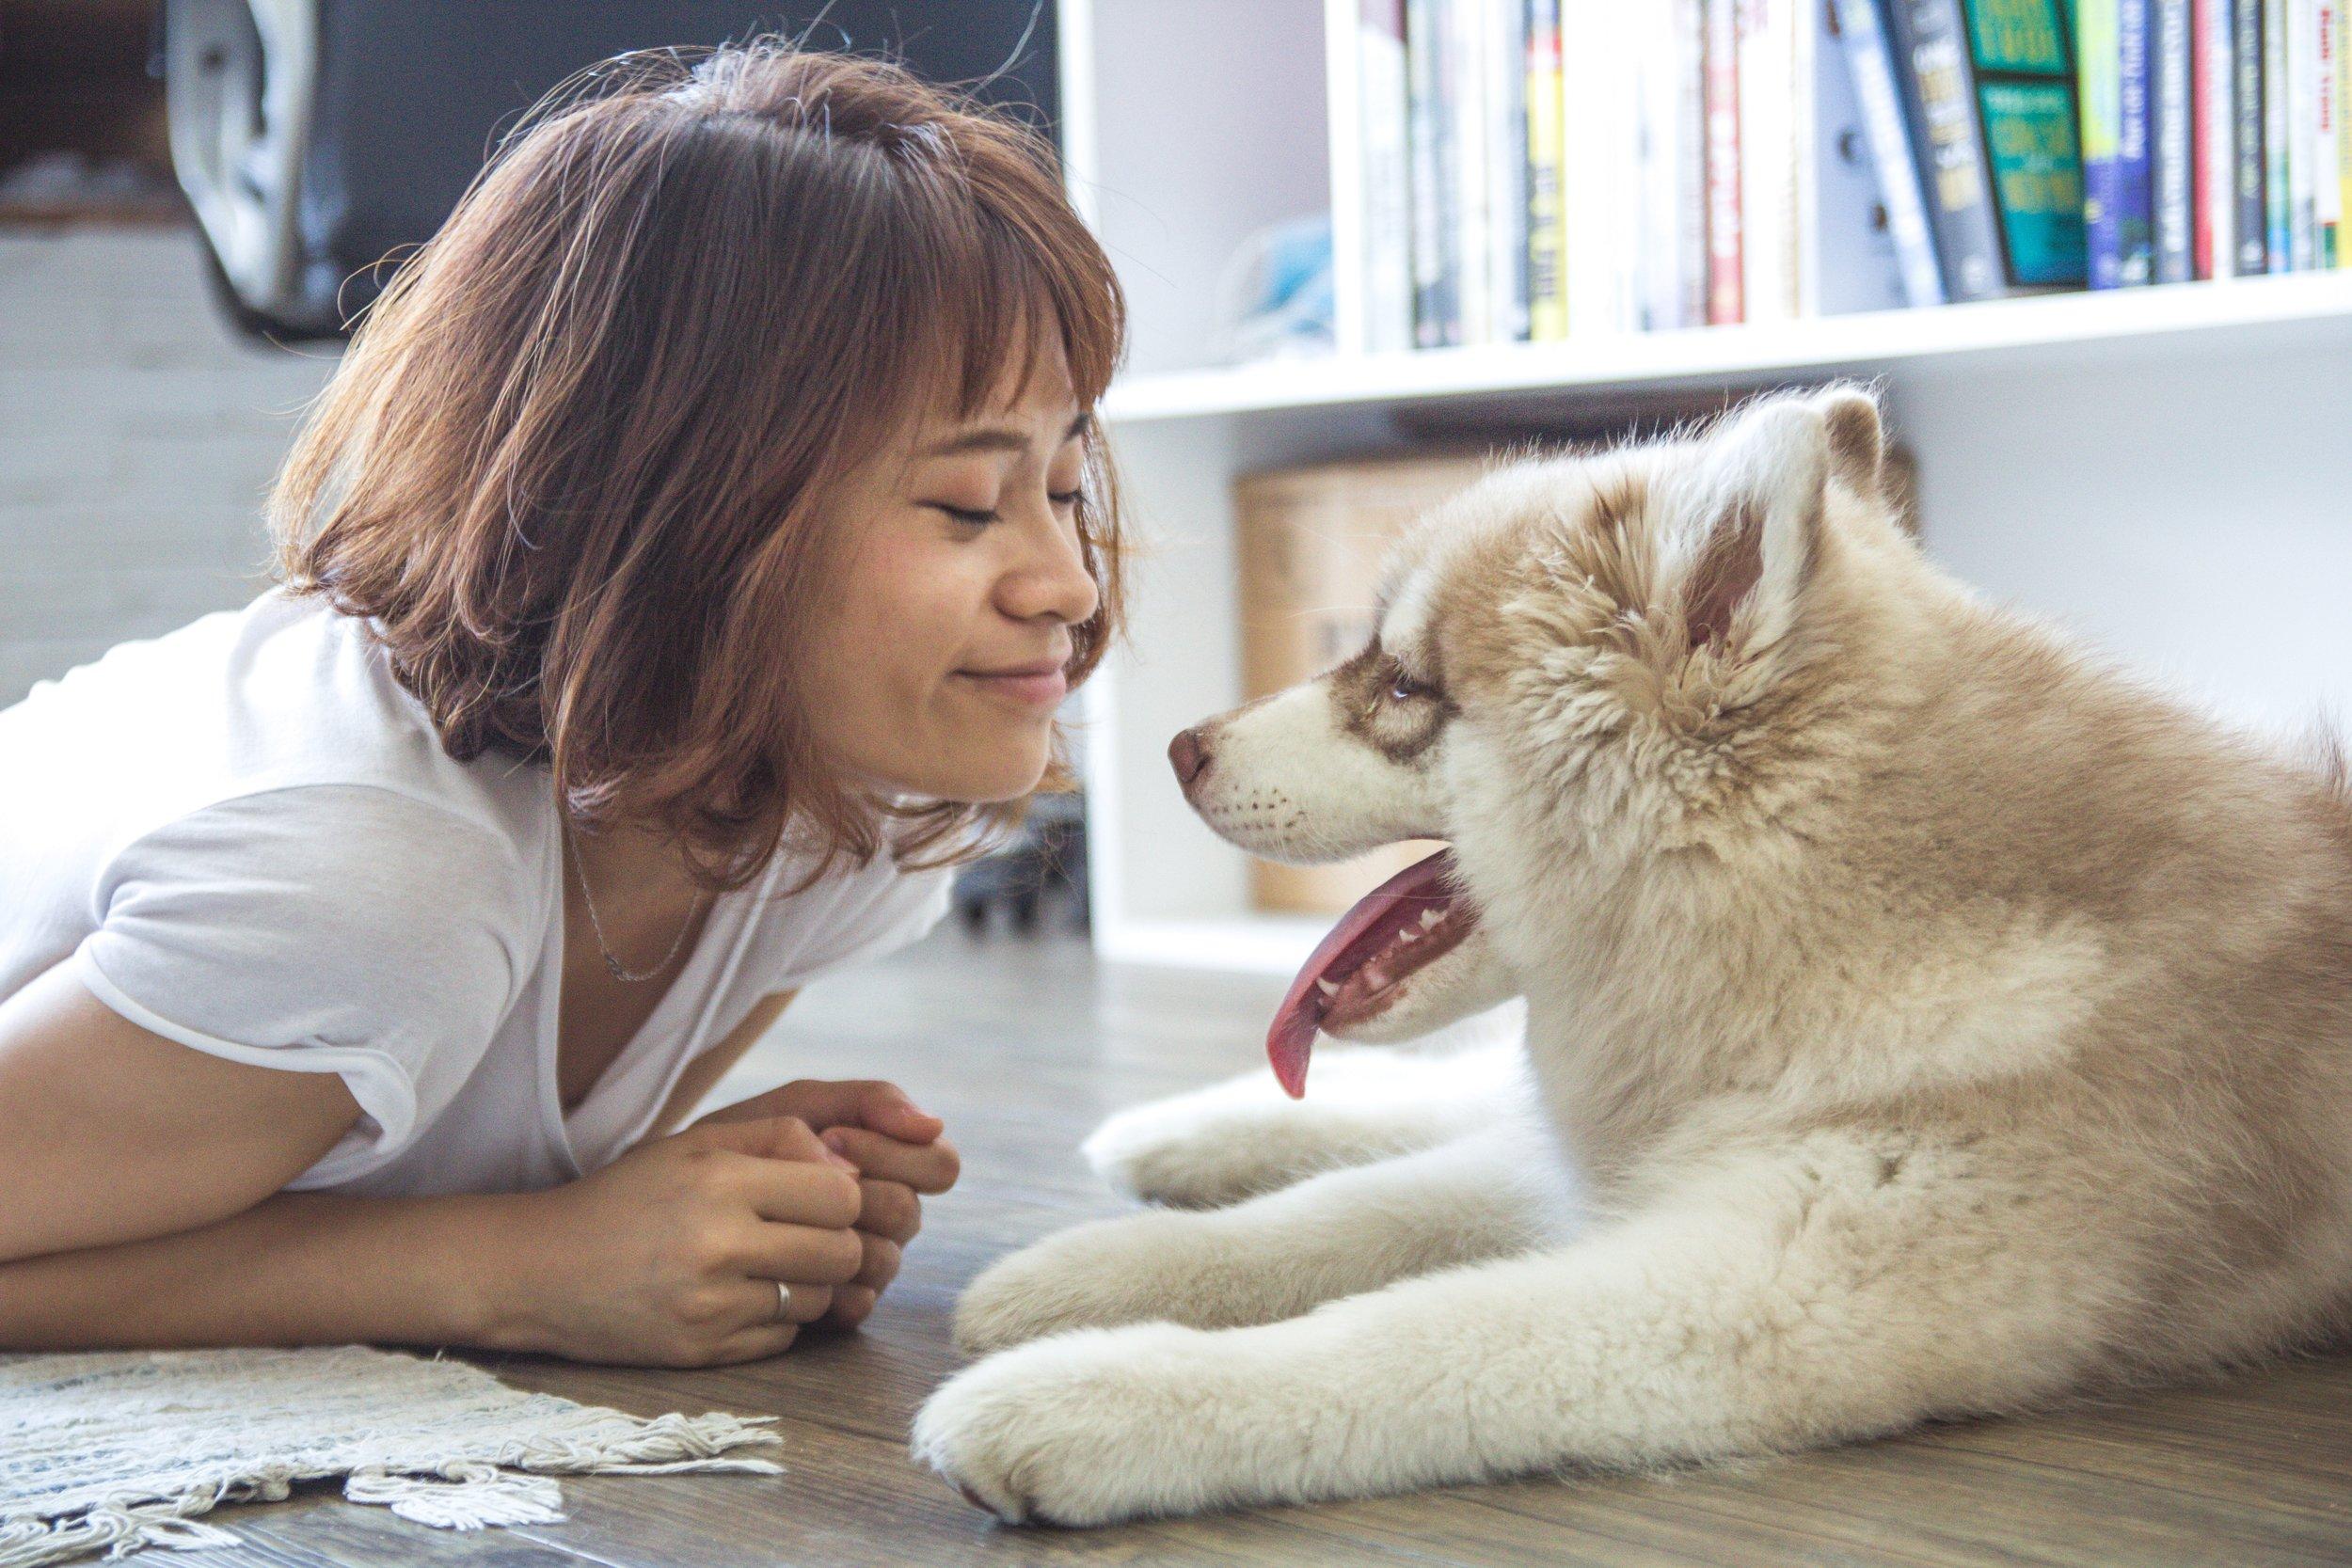 Dog and woman eye contact